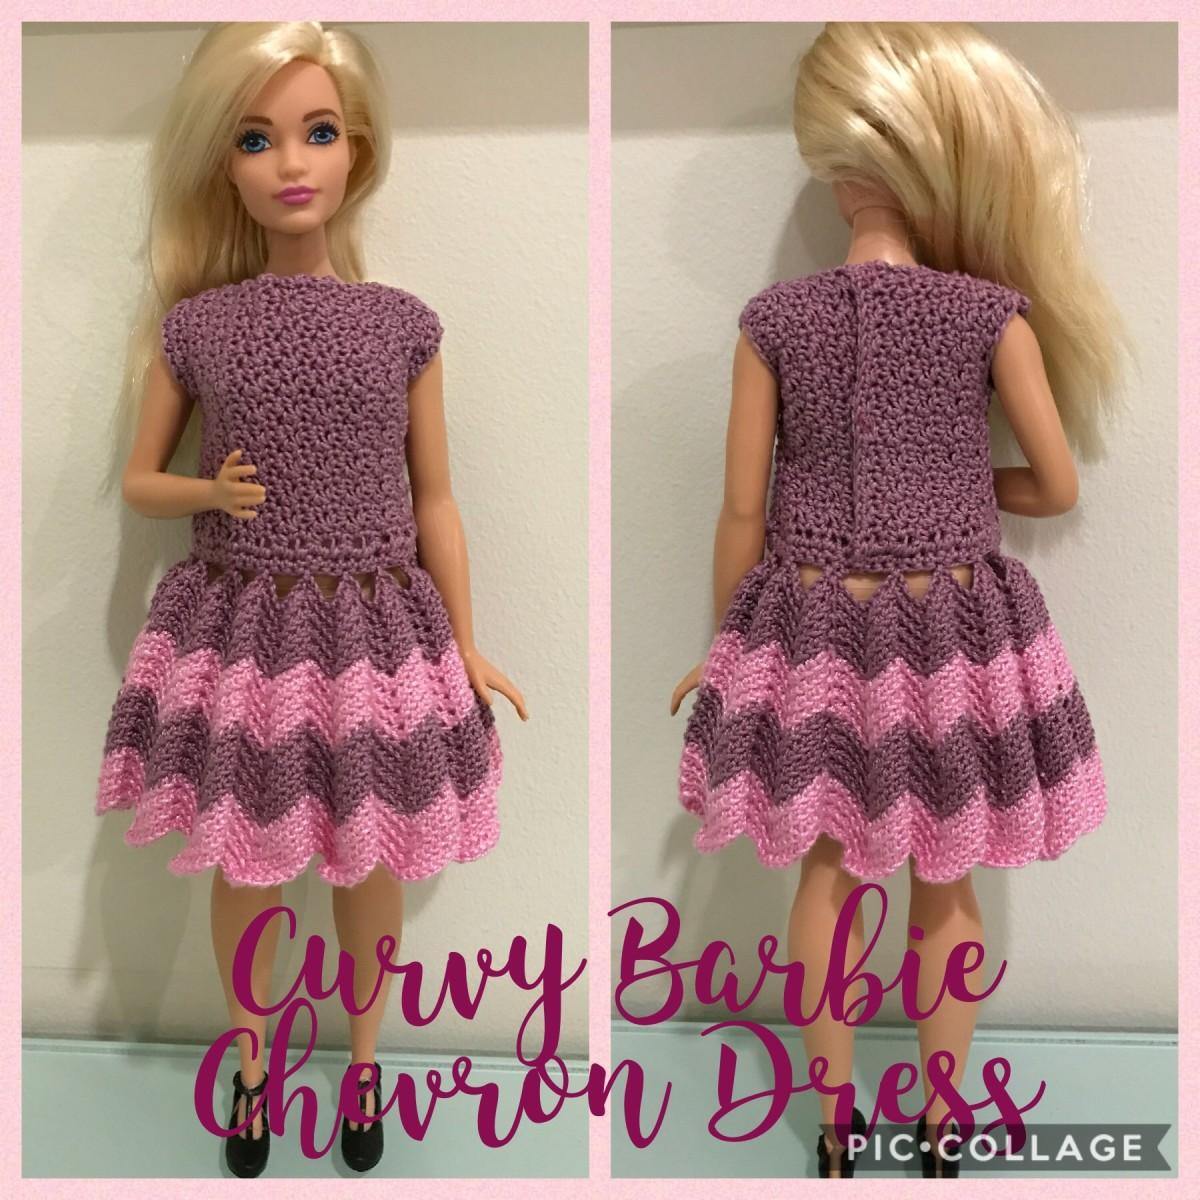 Curvy Barbie Chevron Dress